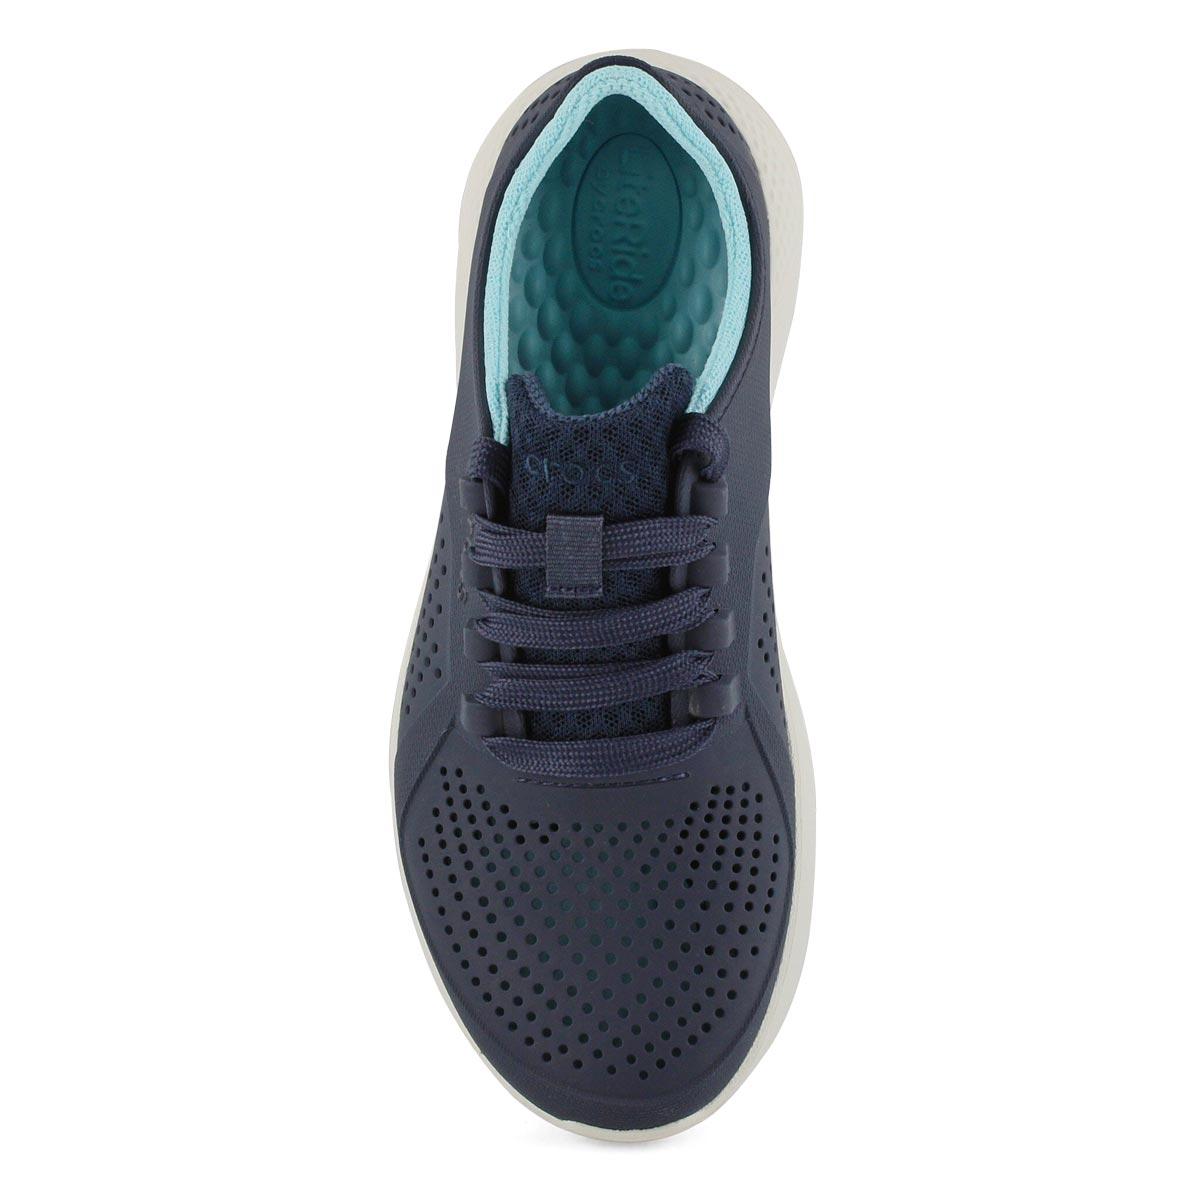 Lds LiteRide Pacer nvy/ice blu sneaker